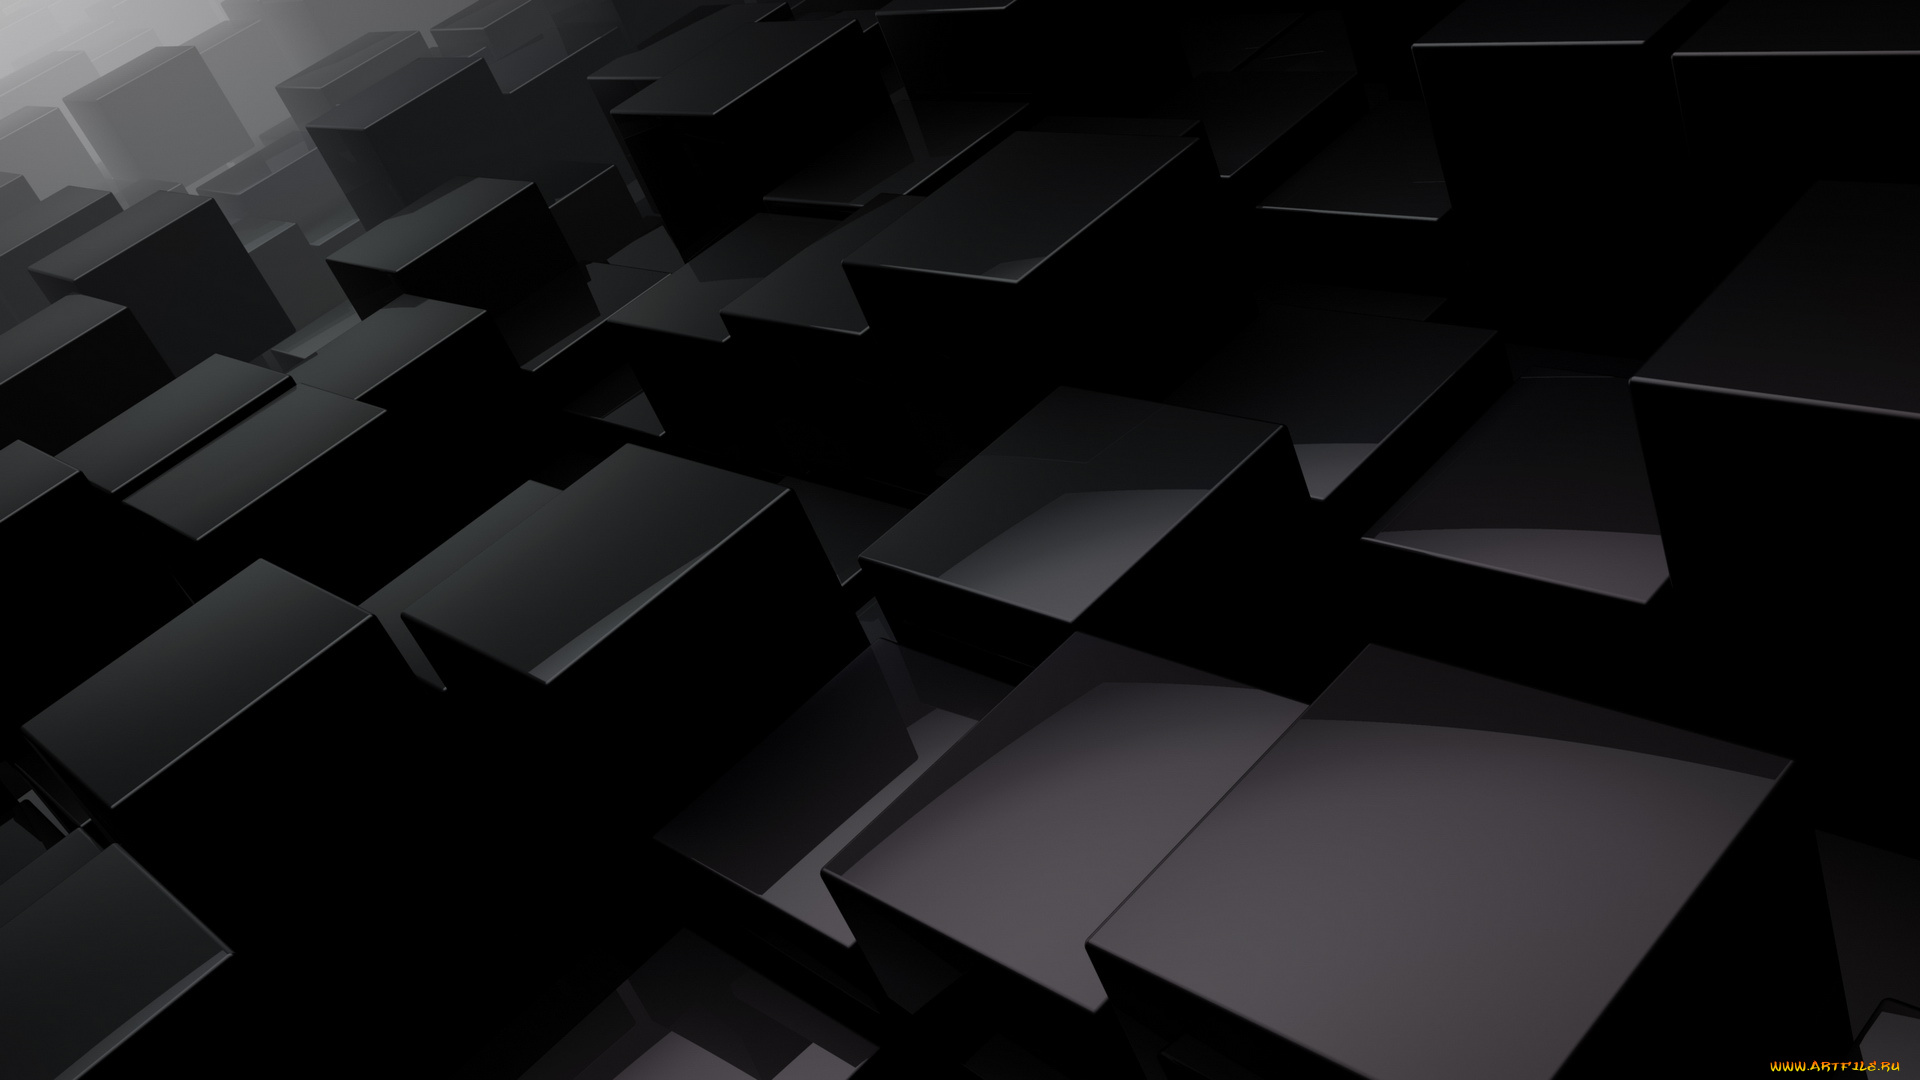 full black wallpaper - HD1920×1080